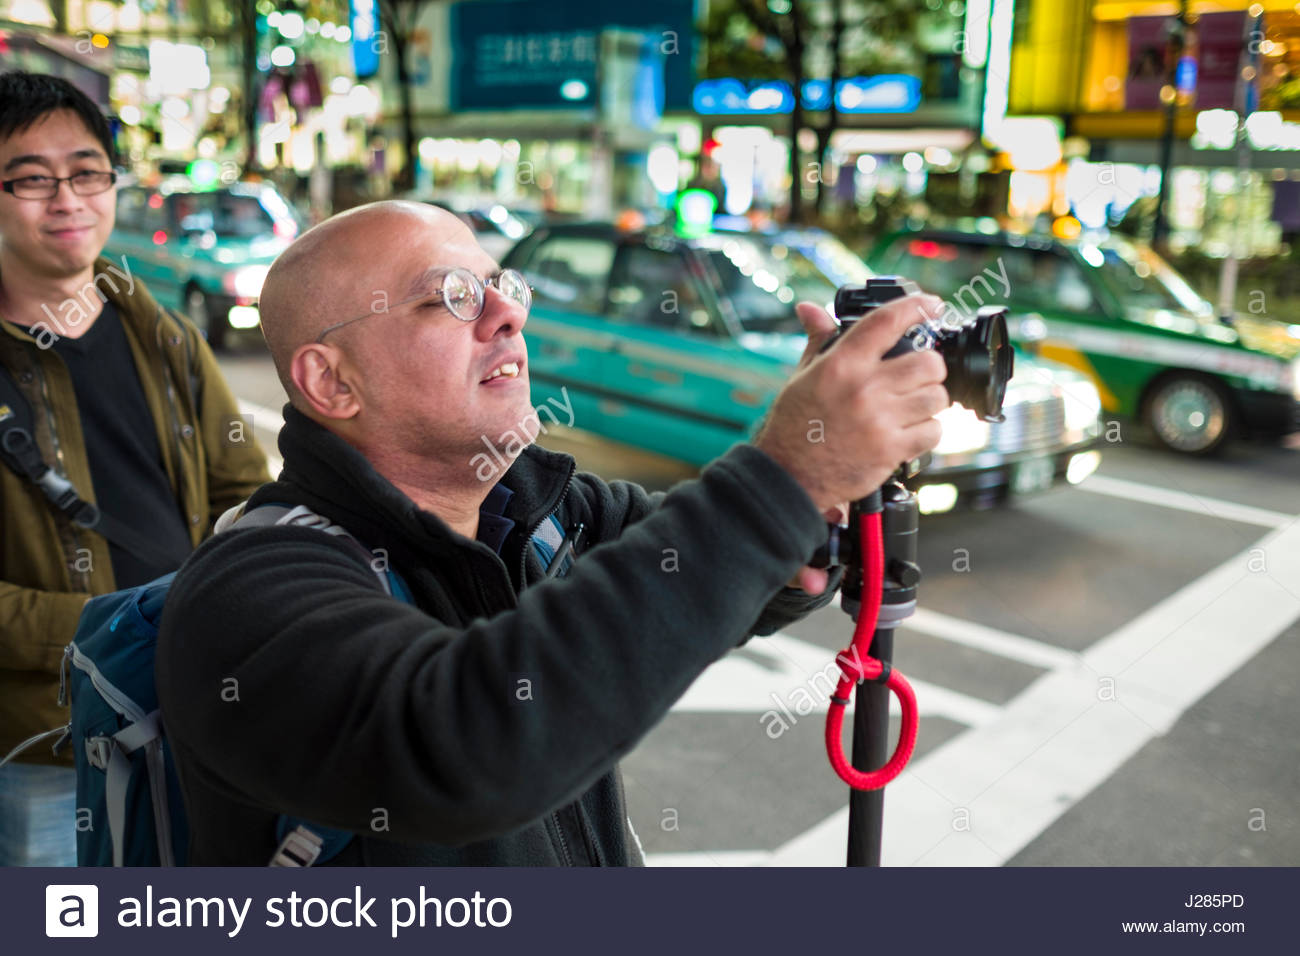 Male photographer photographing the world famous pedestrian scramble in front of Shibuya Station at dusk, Shibuya, - Stock Image